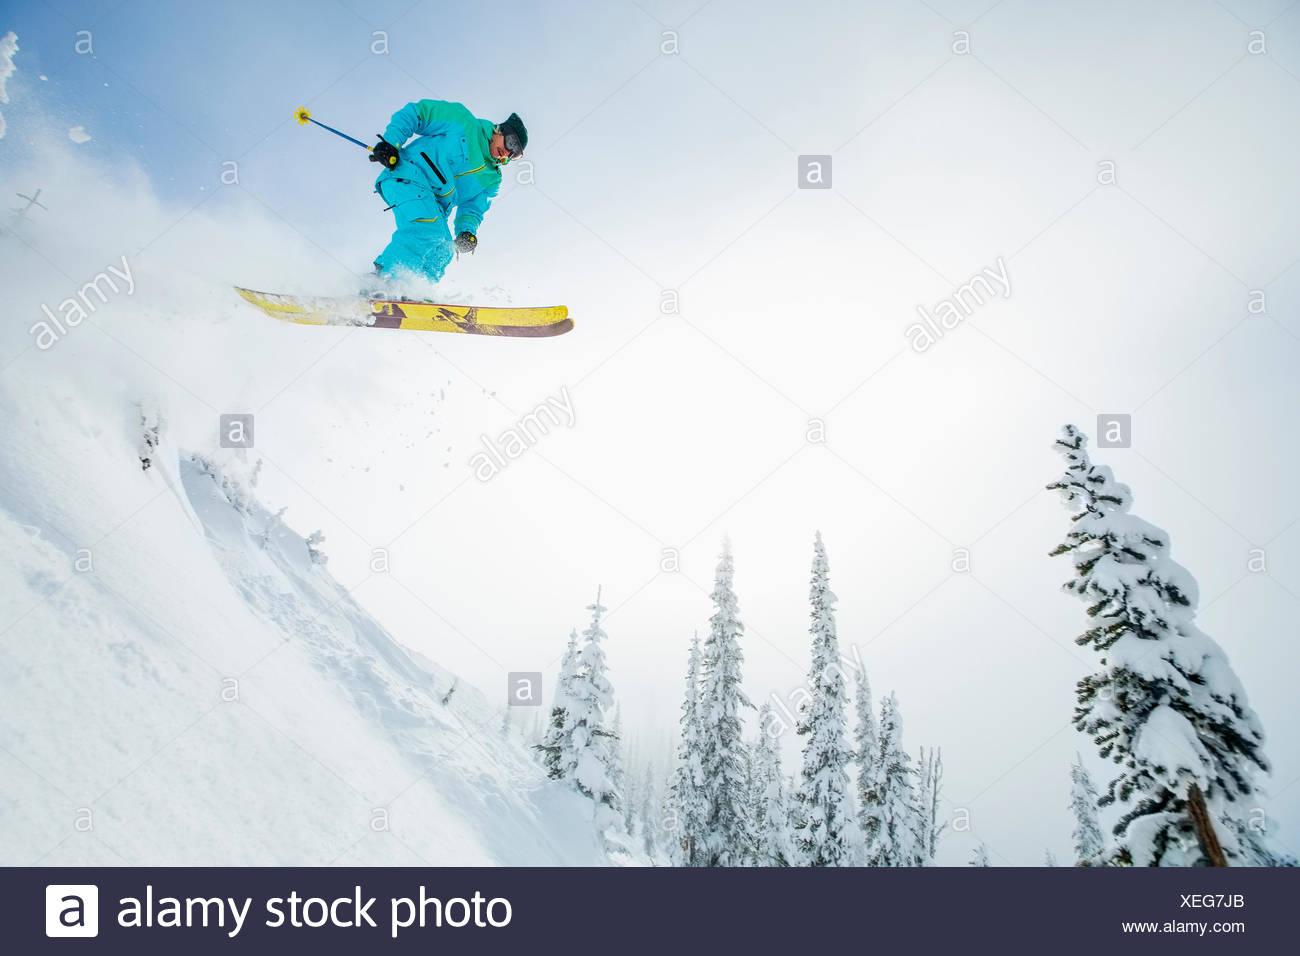 Joven saltando de esquí Imagen De Stock